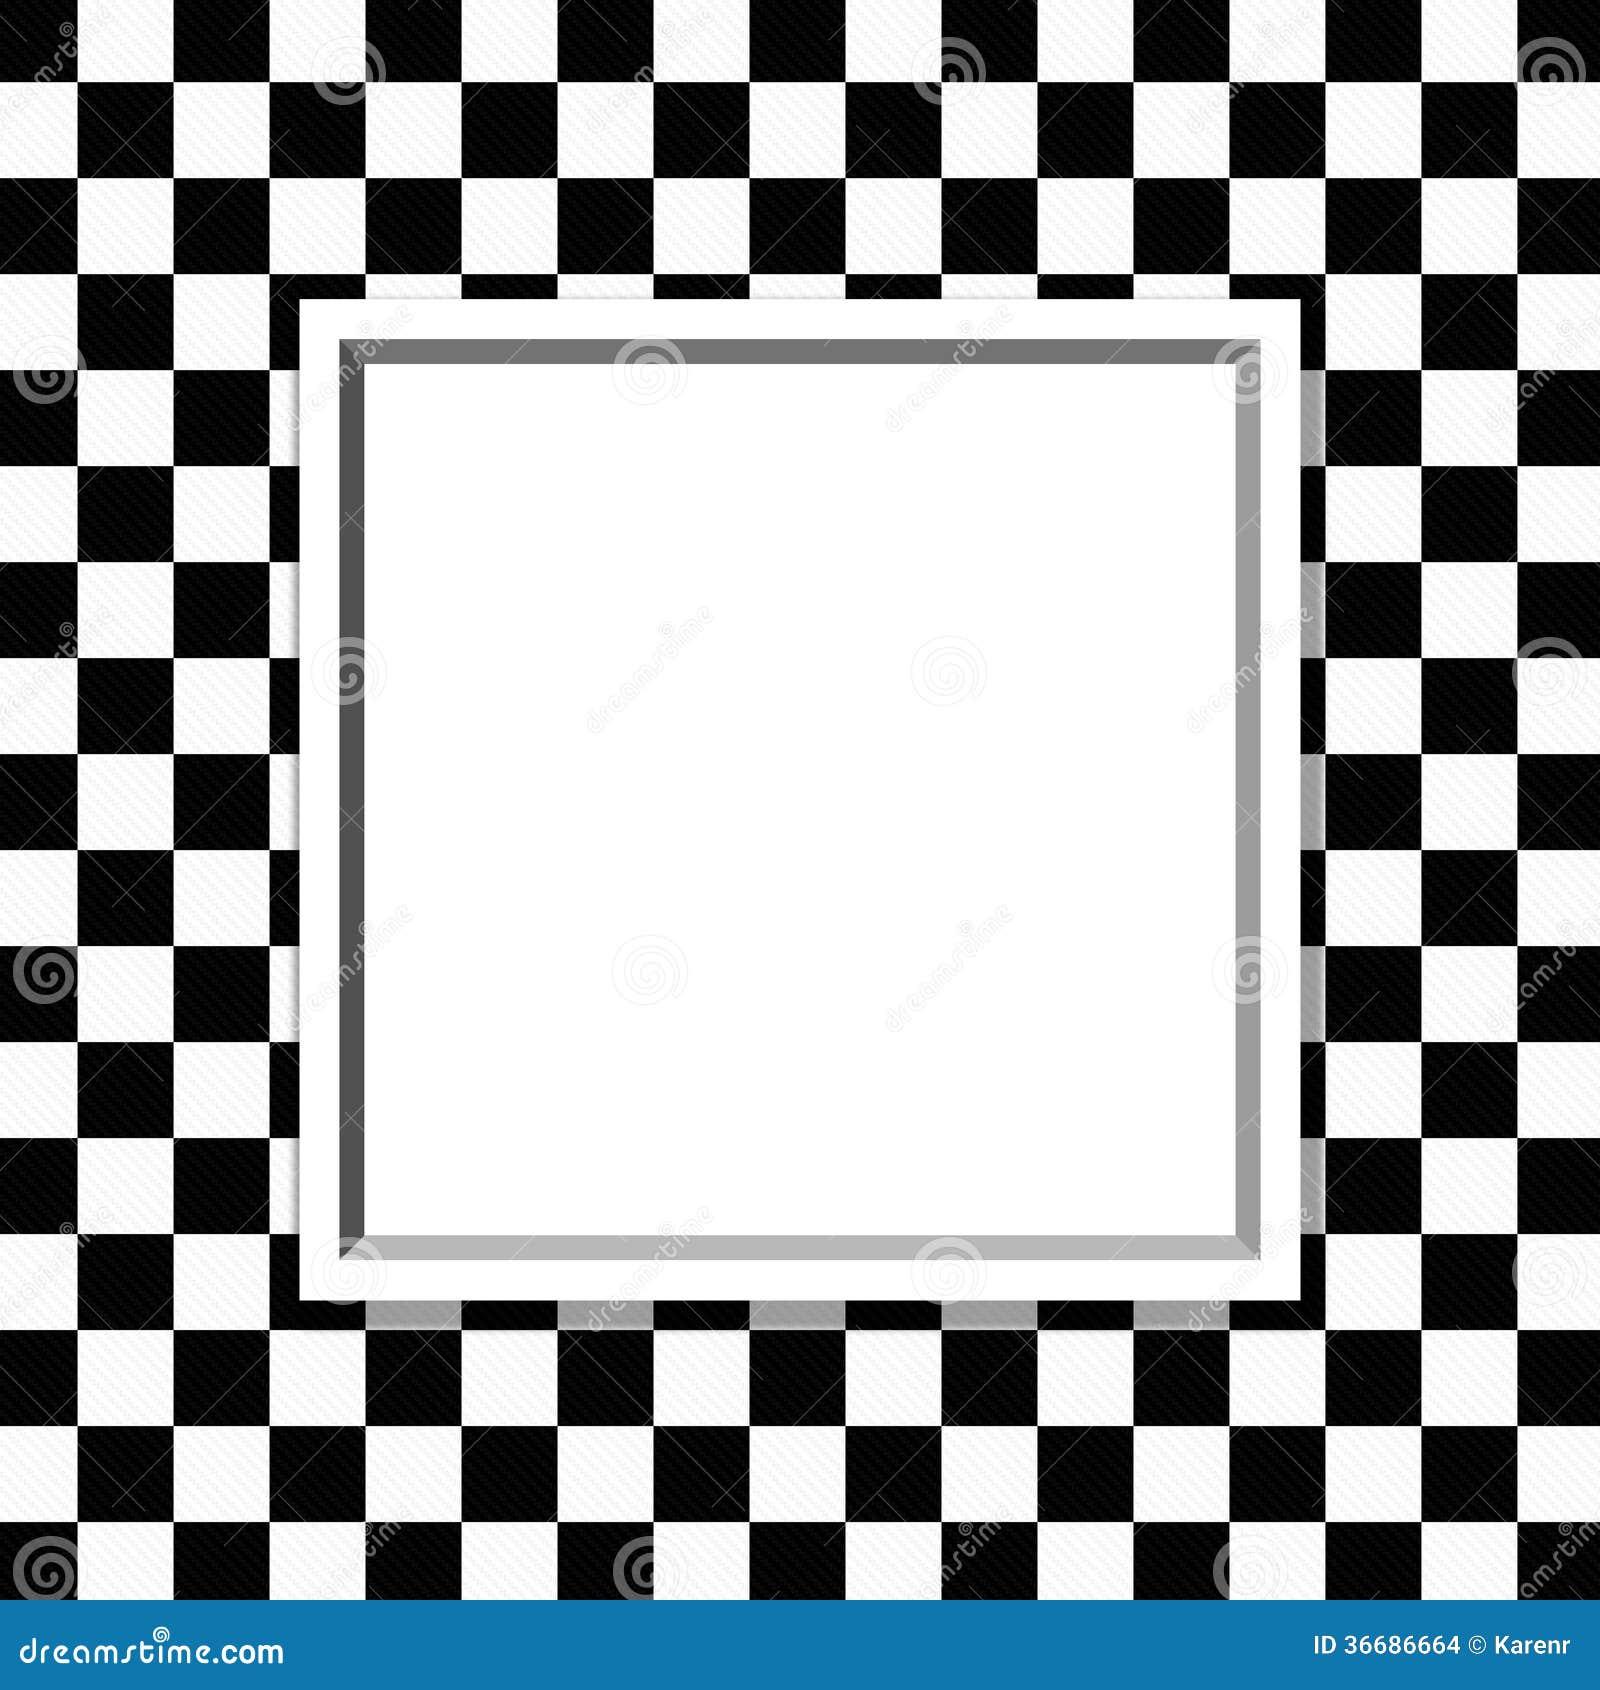 And white checkered flag wallpaper border joy studio design - Black And White Checkered Border Joy Studio Design